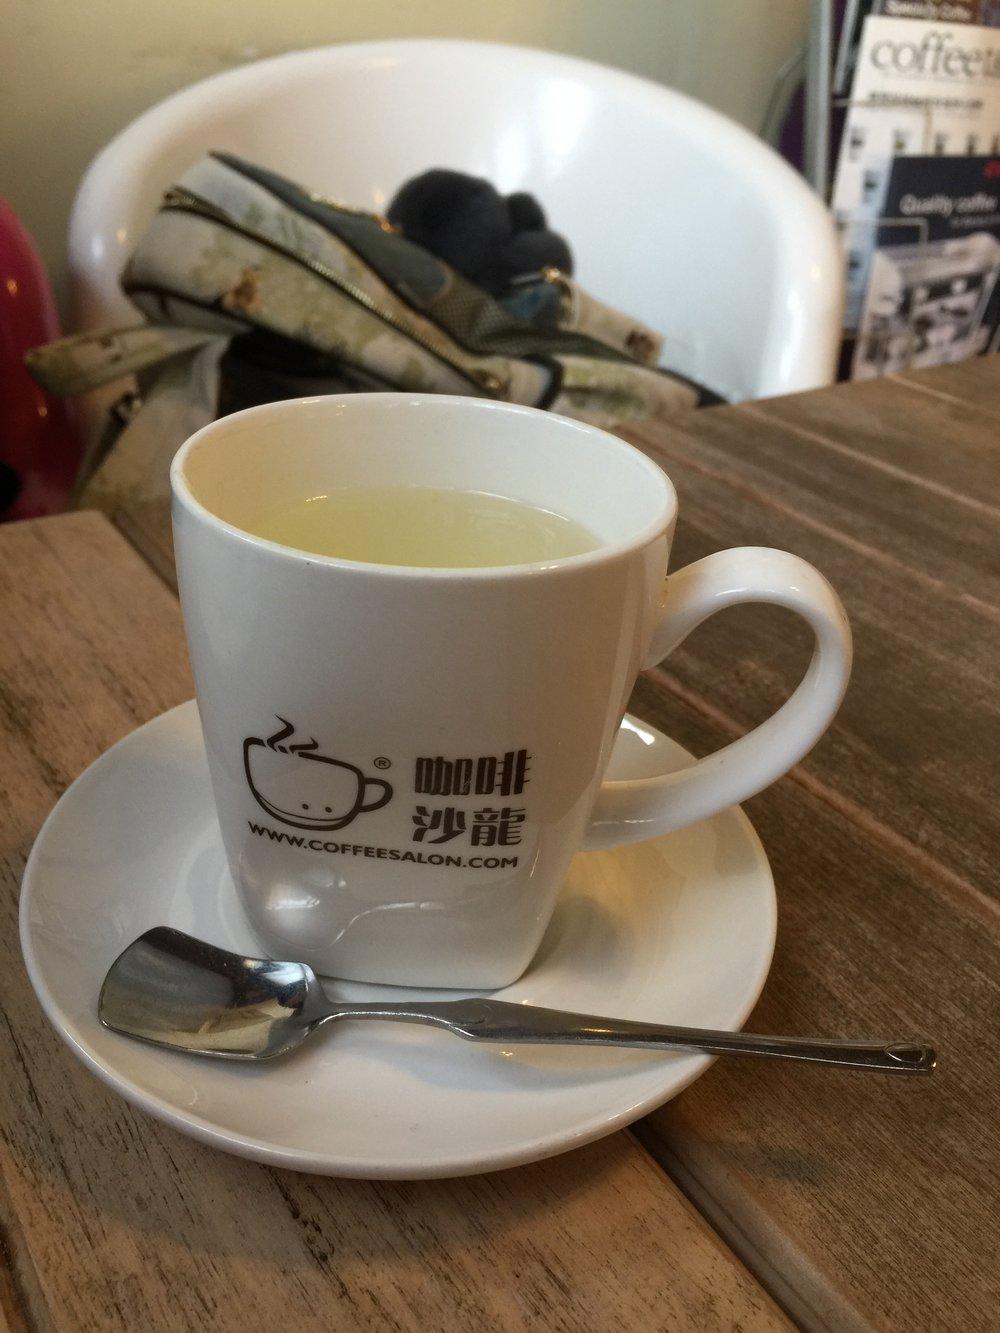 Grapefruit tea - wonderful